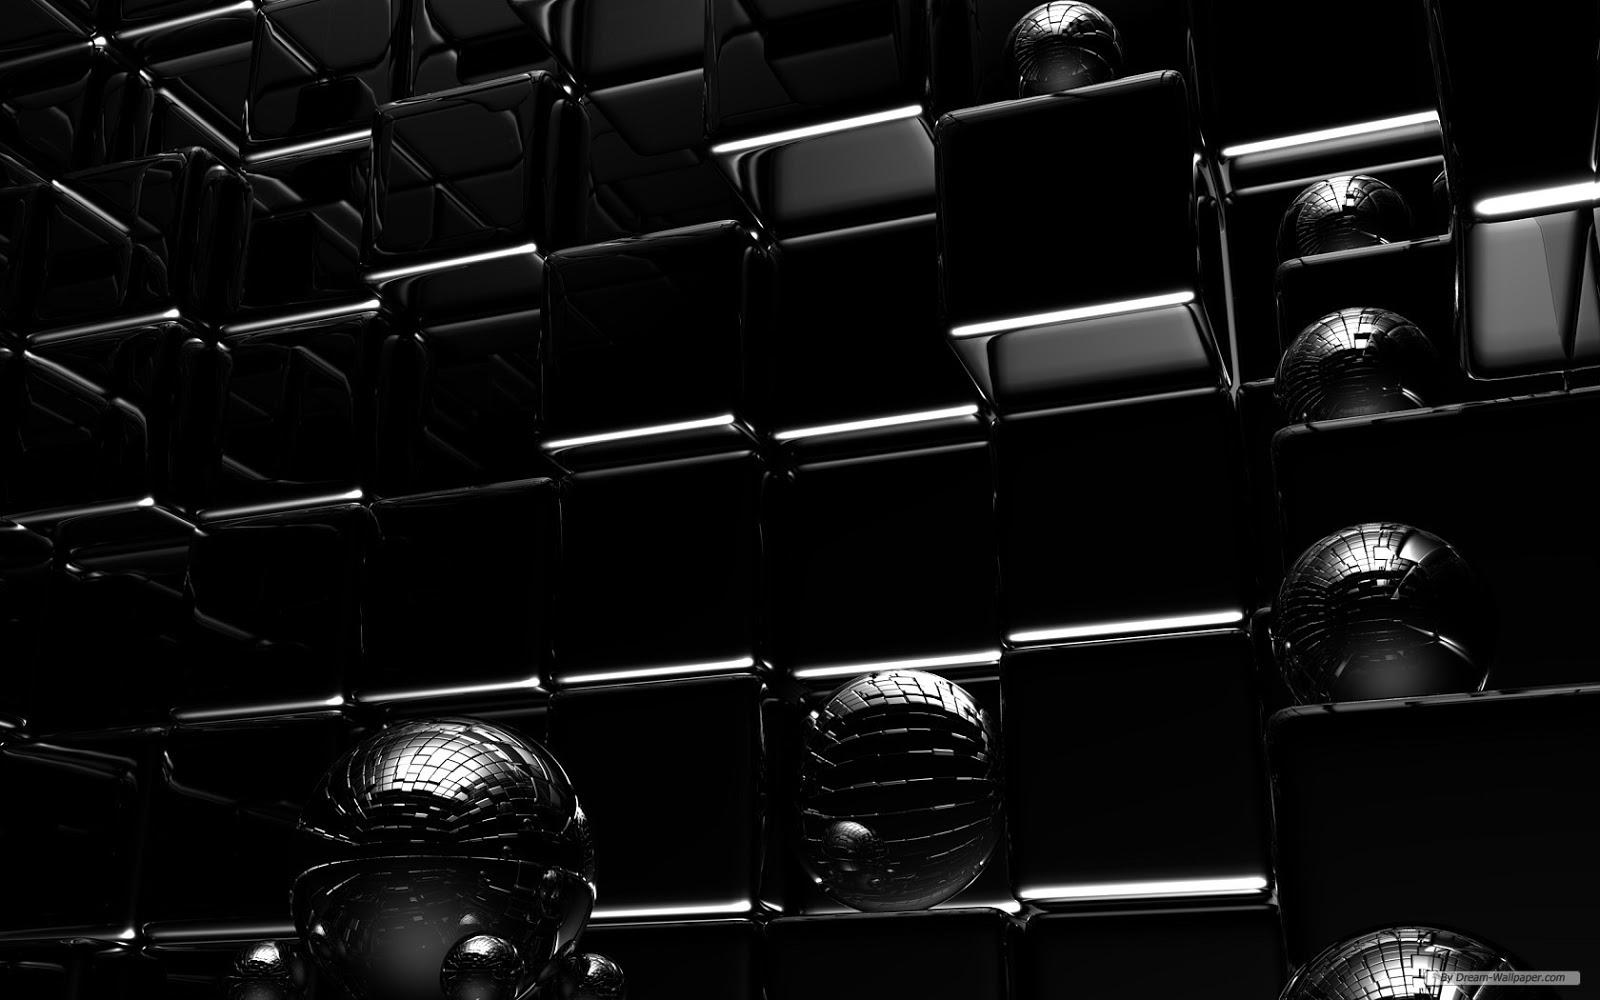 Black Wallpaper 3D Download Wallpaper DaWallpaperz 1600x1000